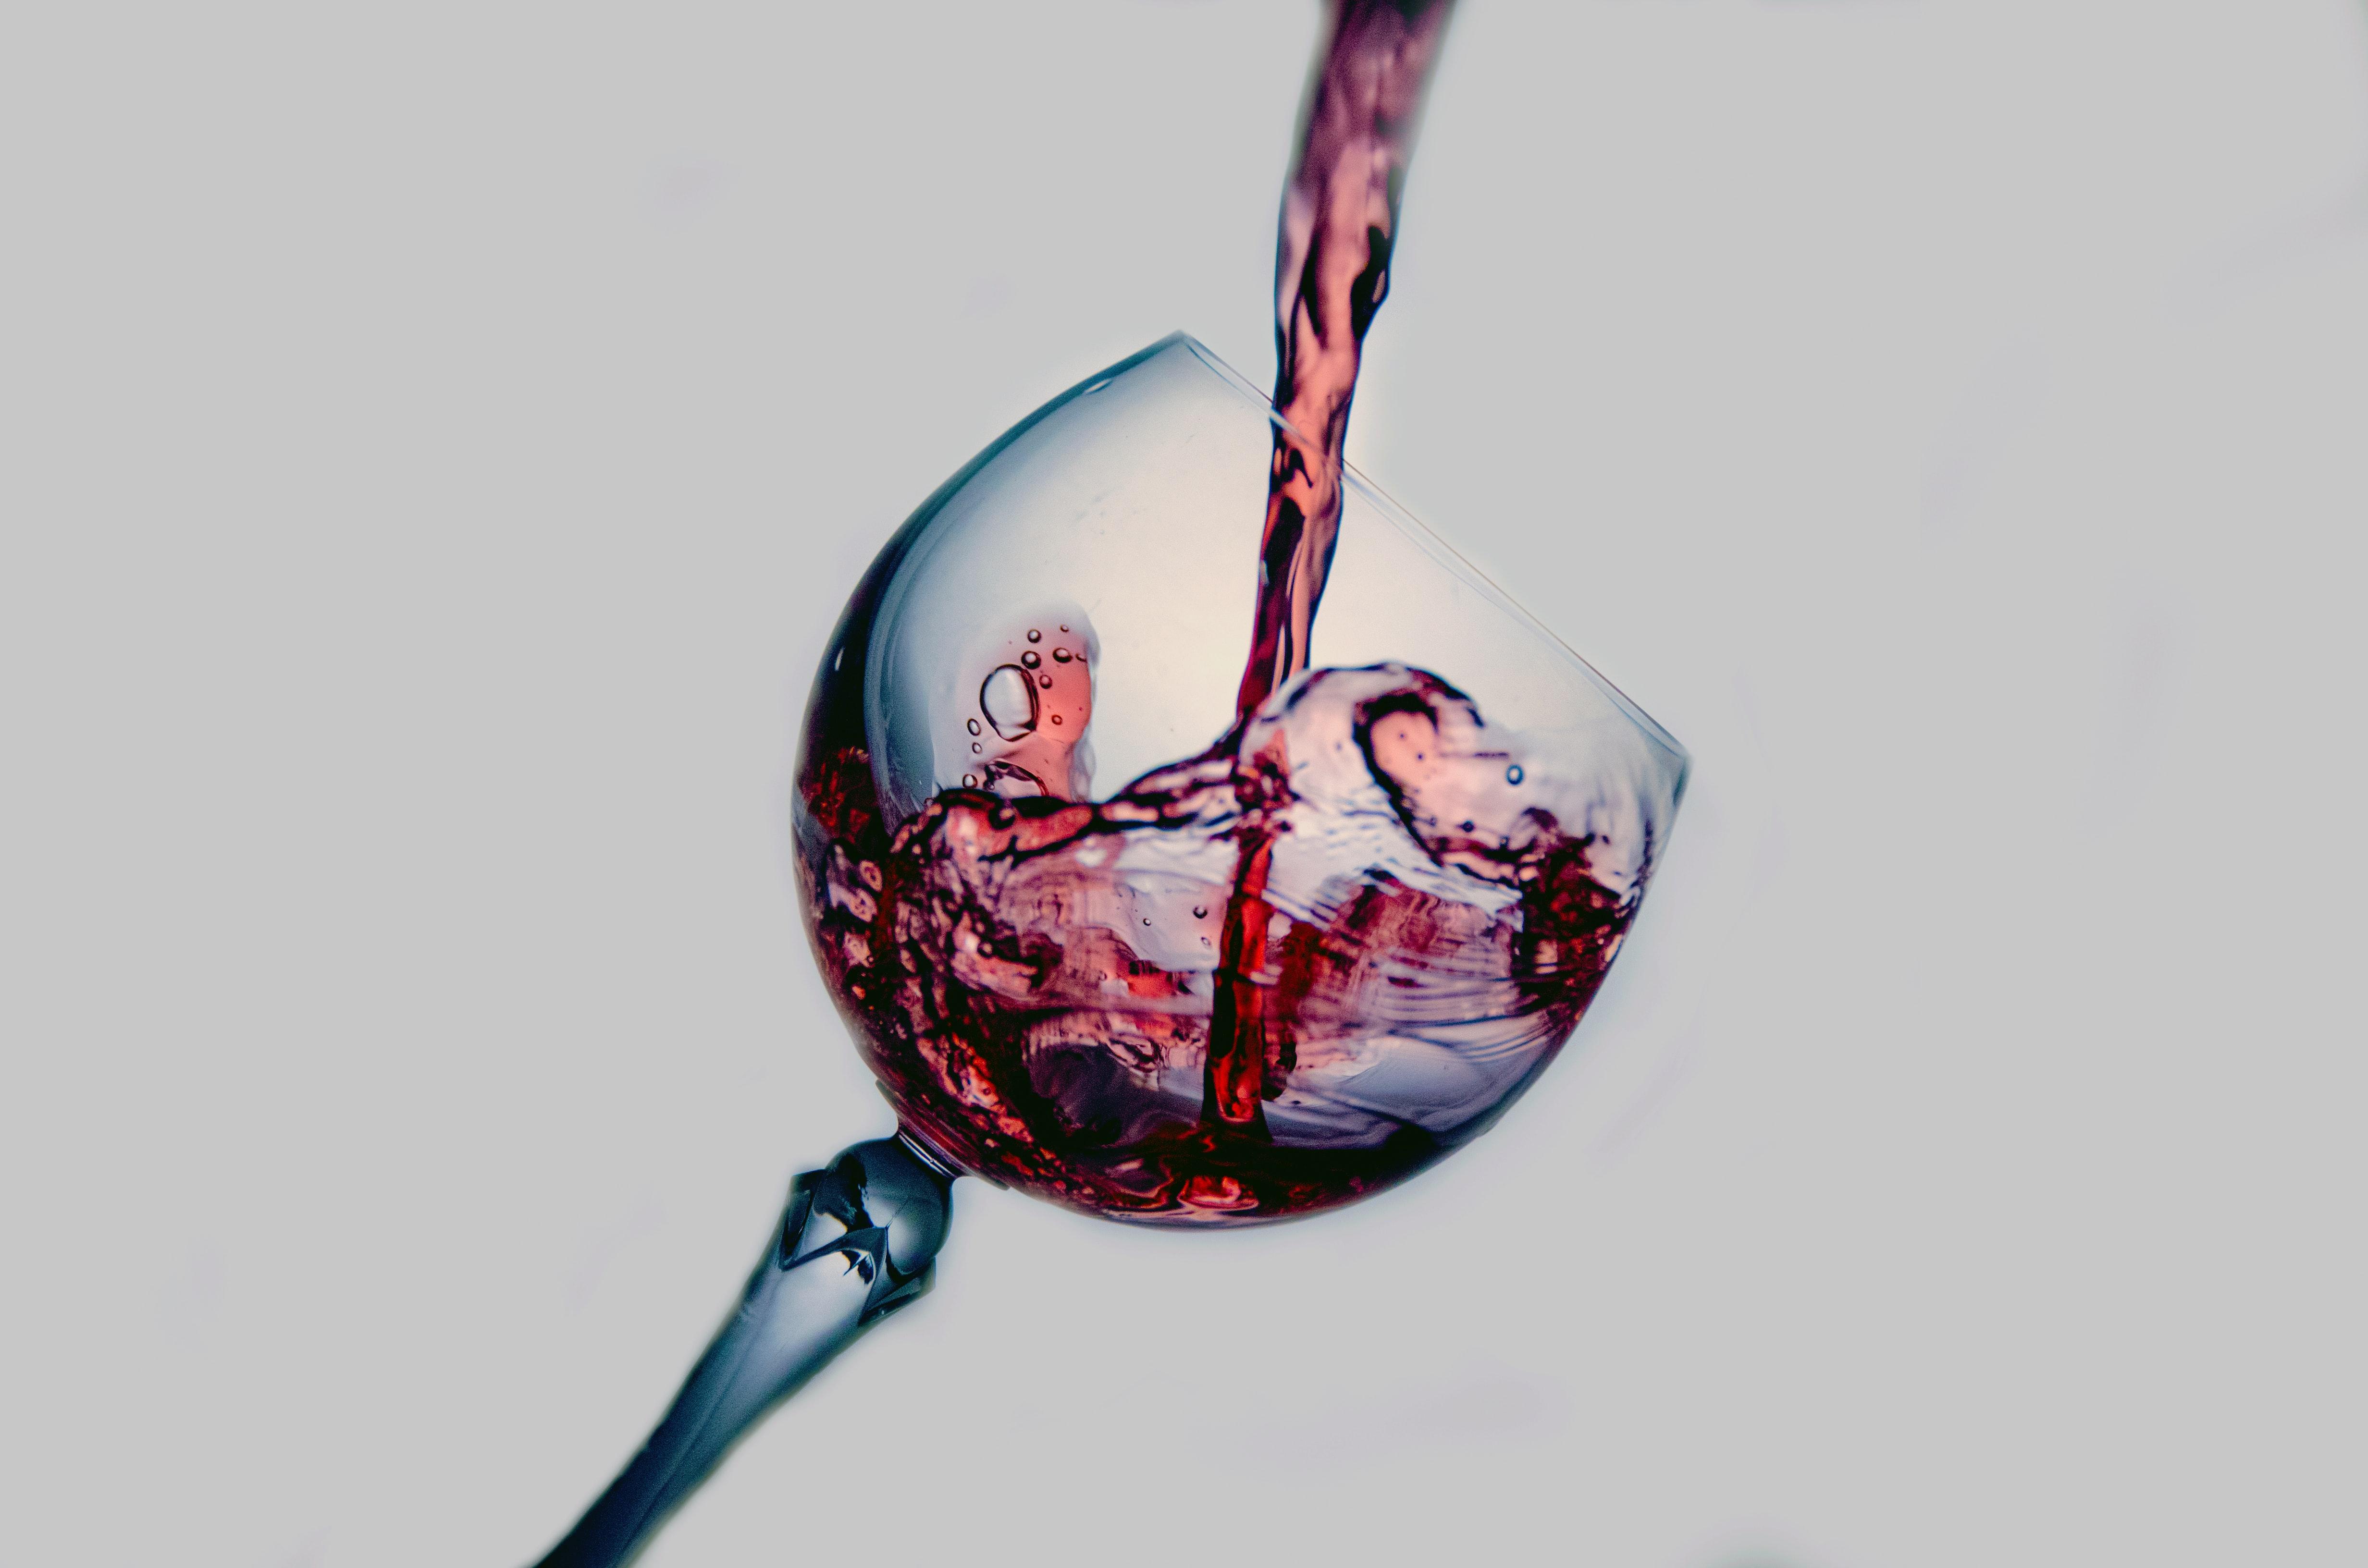 vinos en oferta